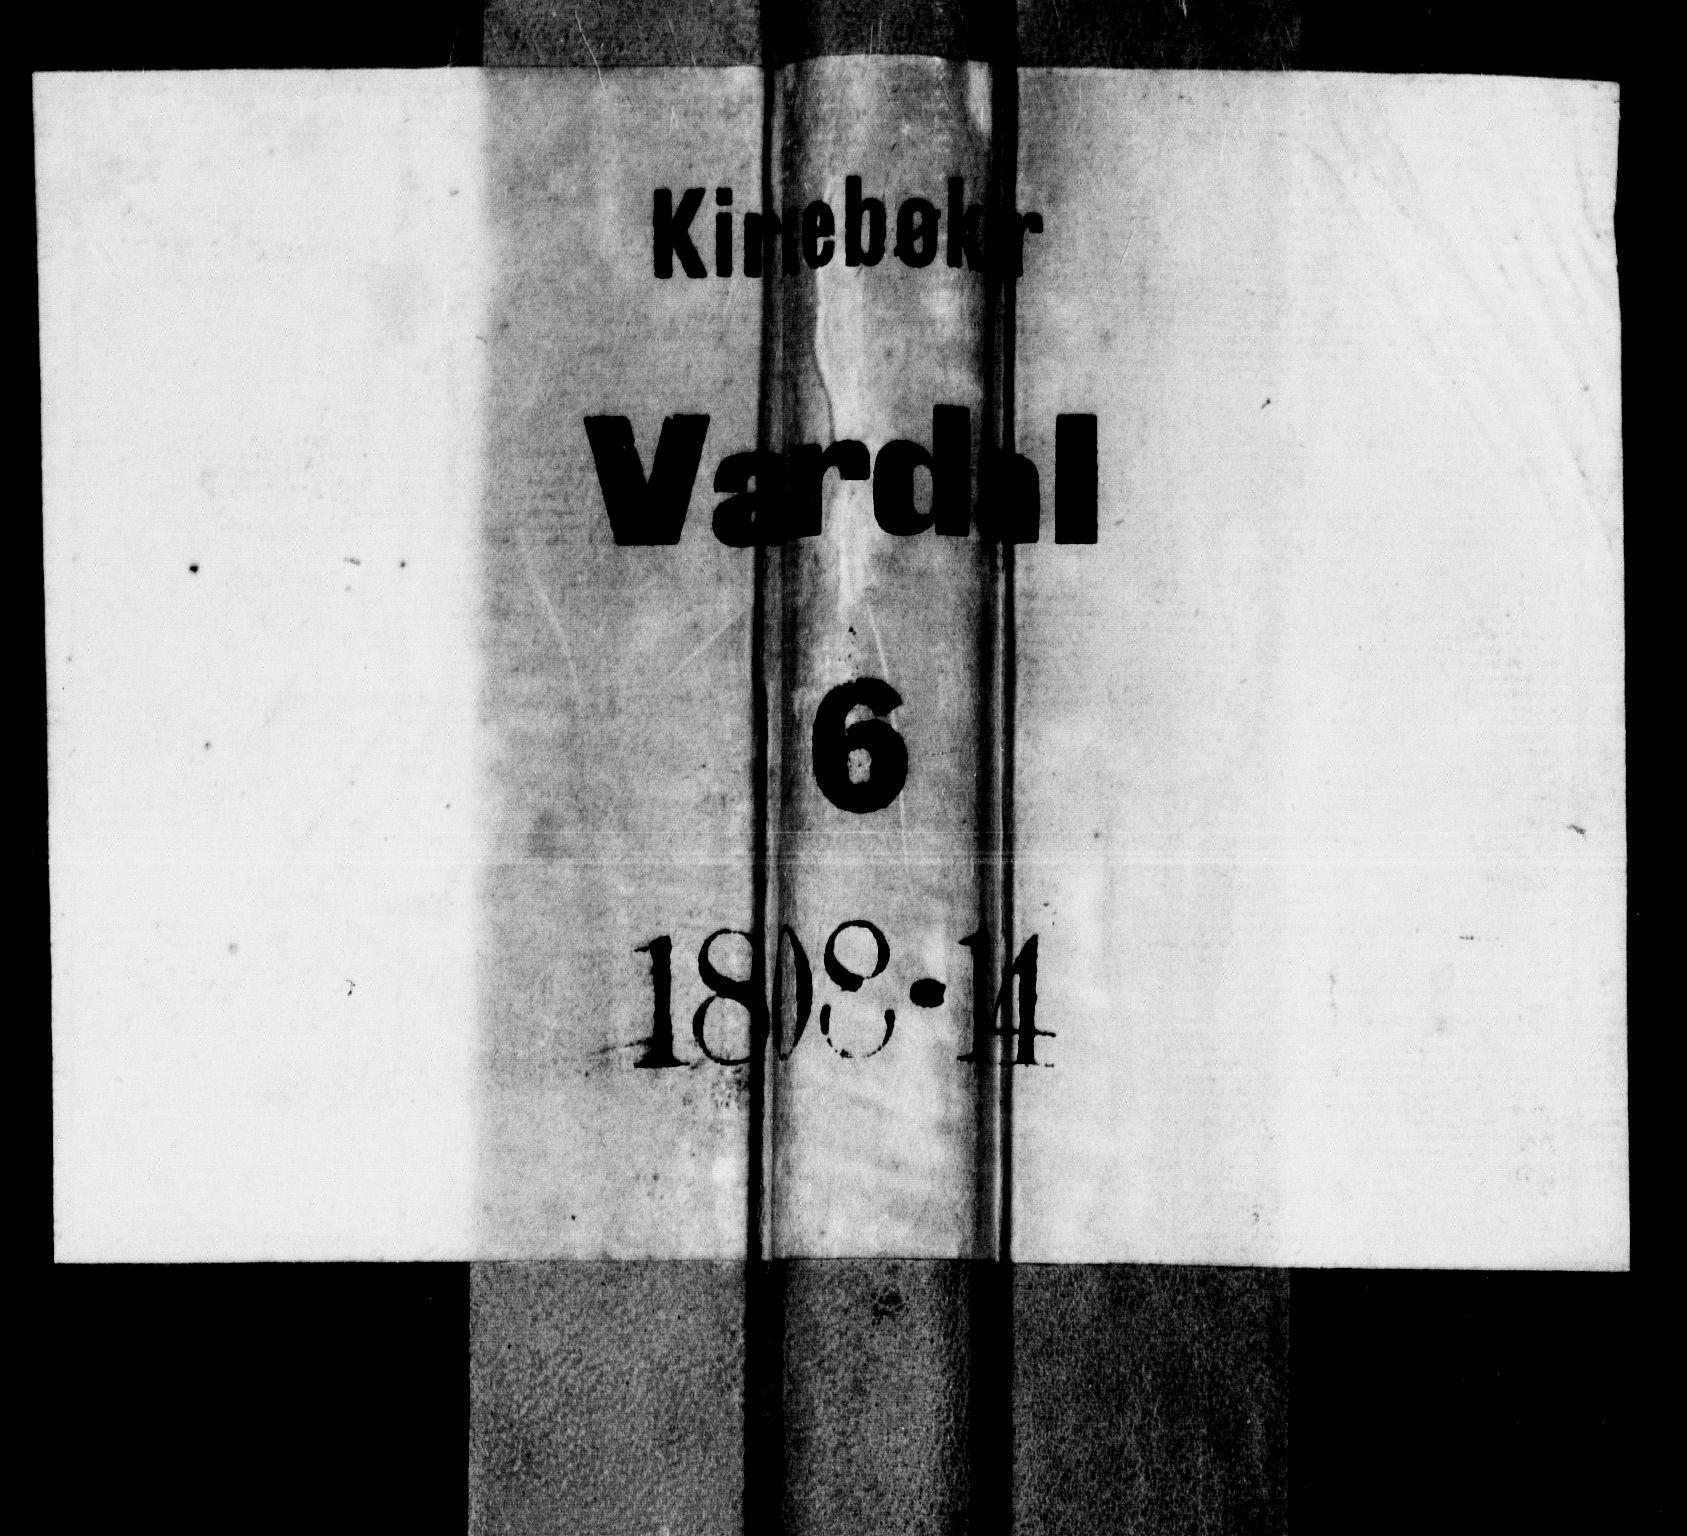 SAH, Vardal prestekontor, H/Ha/Haa/L0003: Ministerialbok nr. 3, 1808-1814